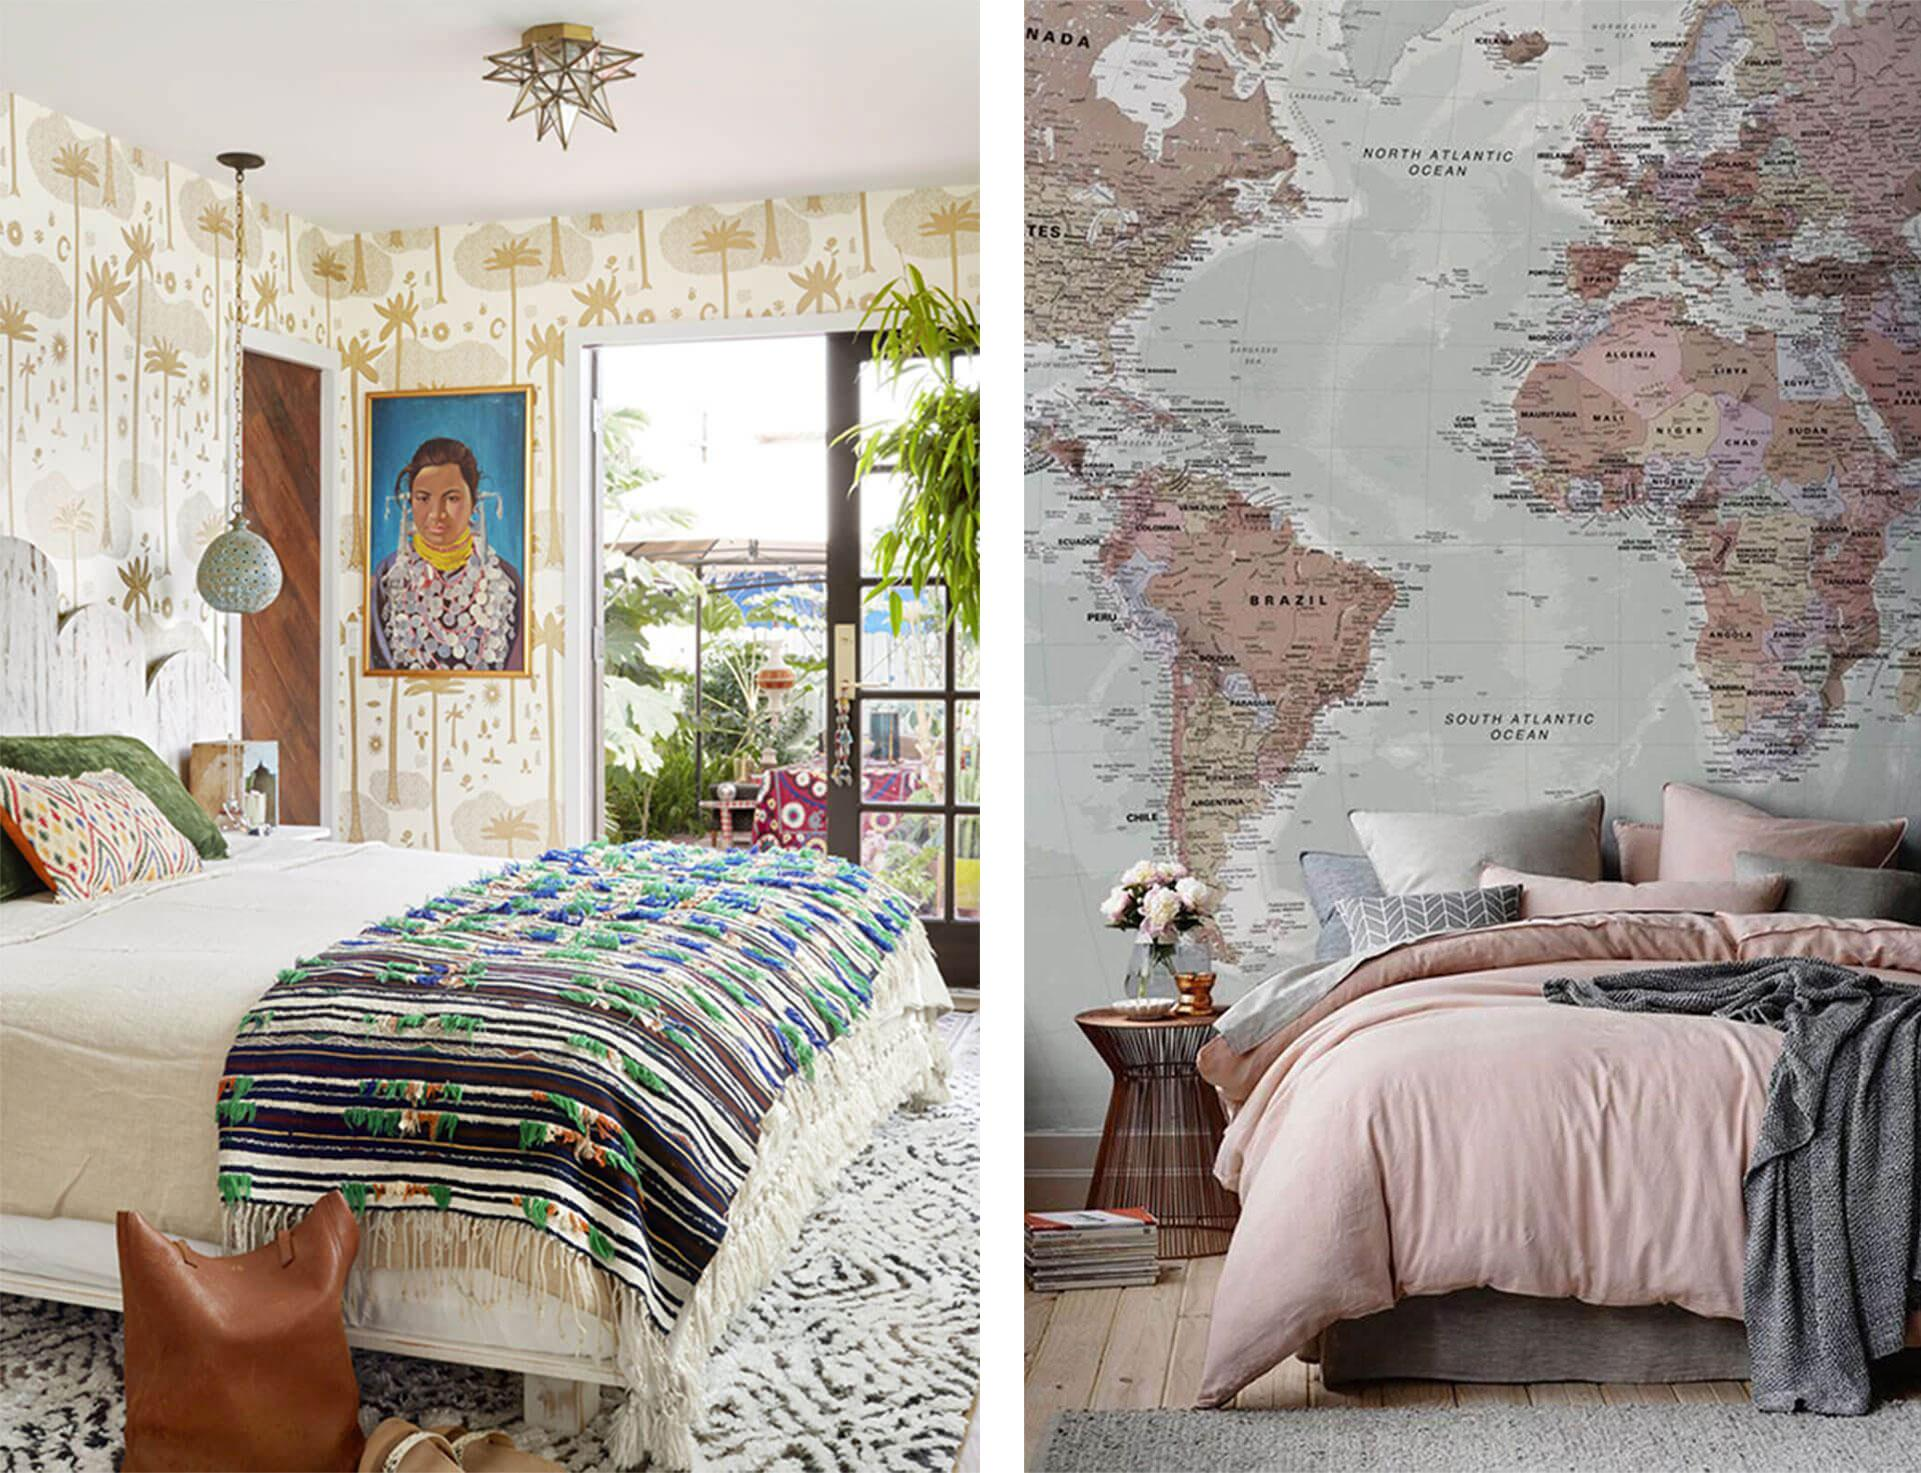 Bedroom wallpaper in various designs.